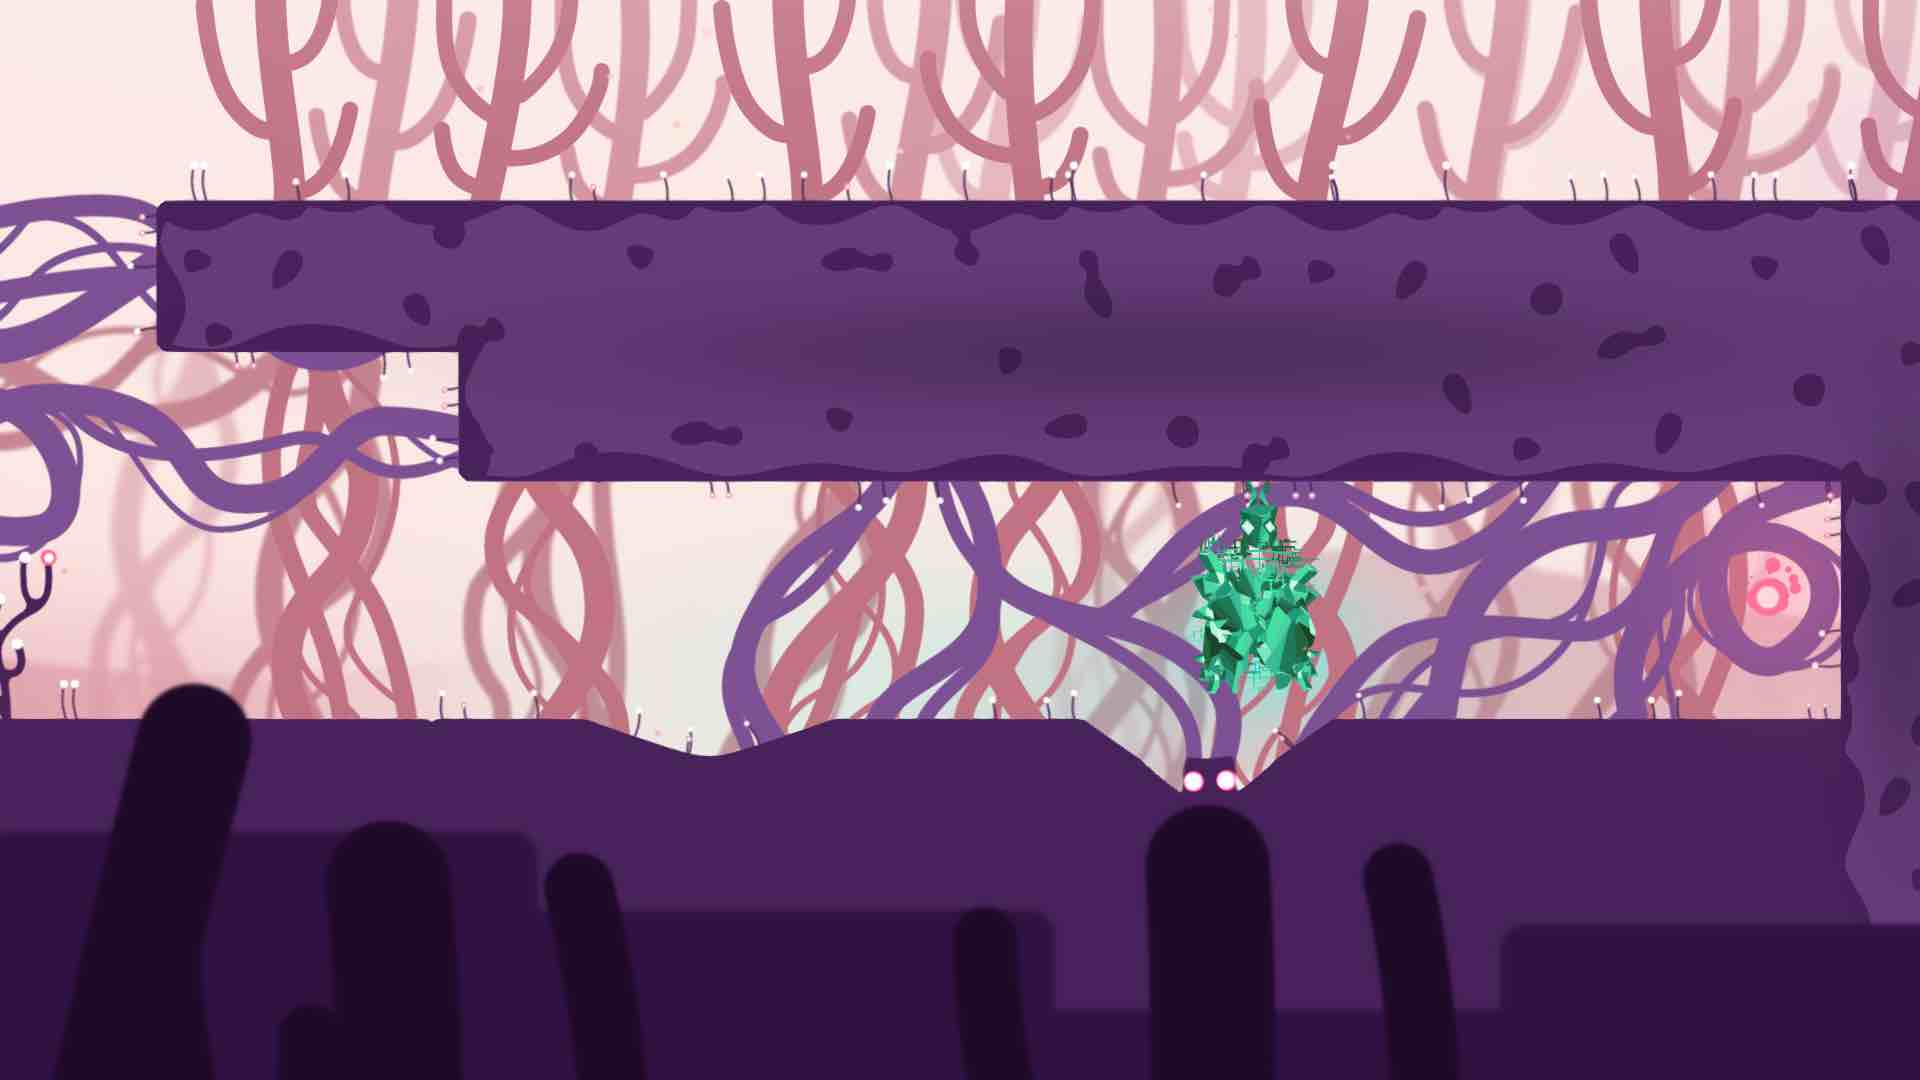 semblance-screenshot-4